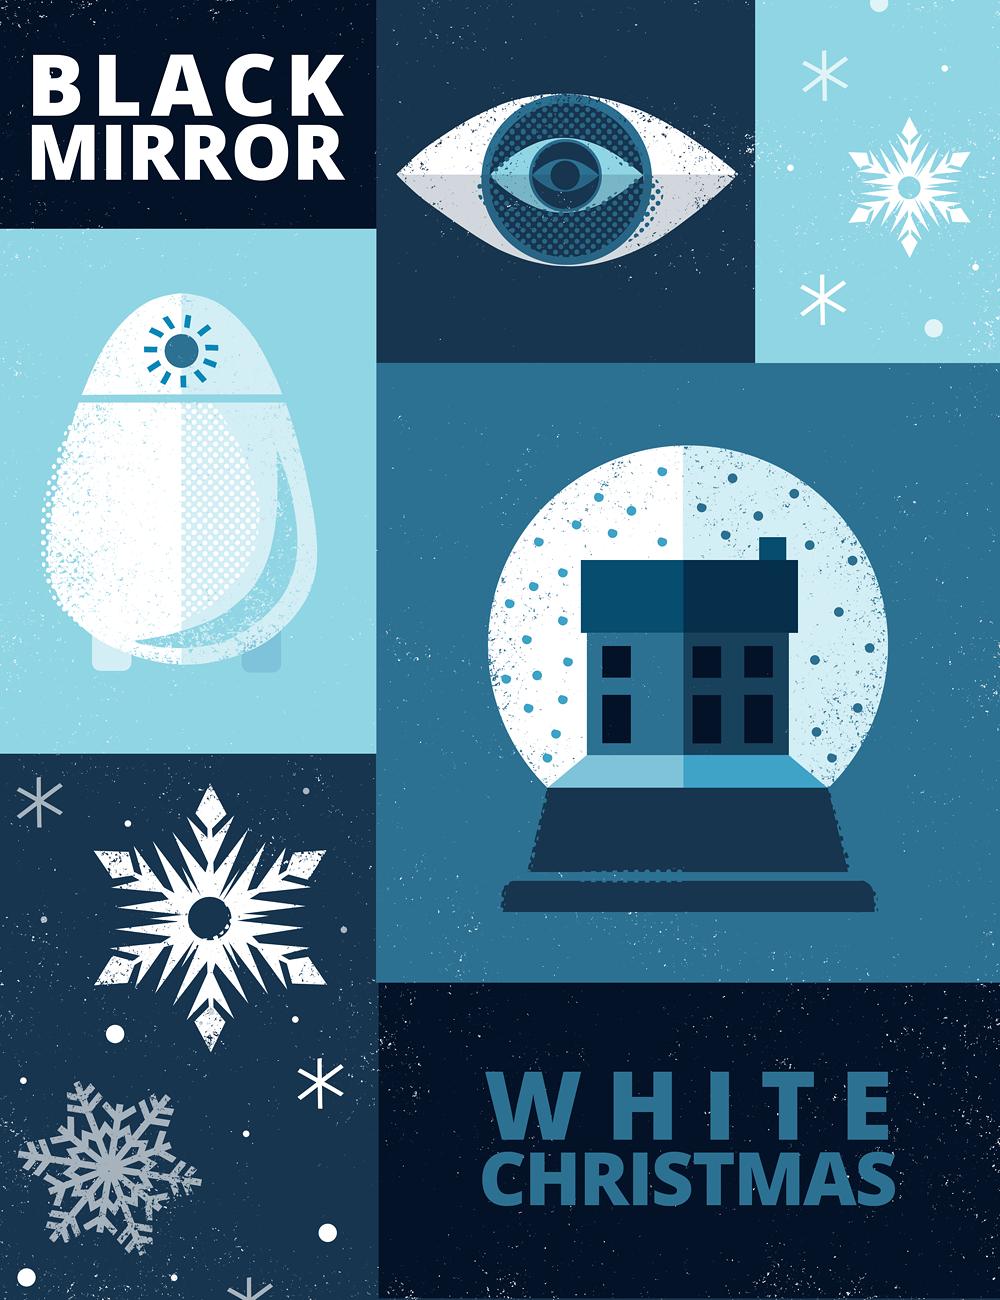 White Christmas Black Mirror Poster.White Christmas Posterspy